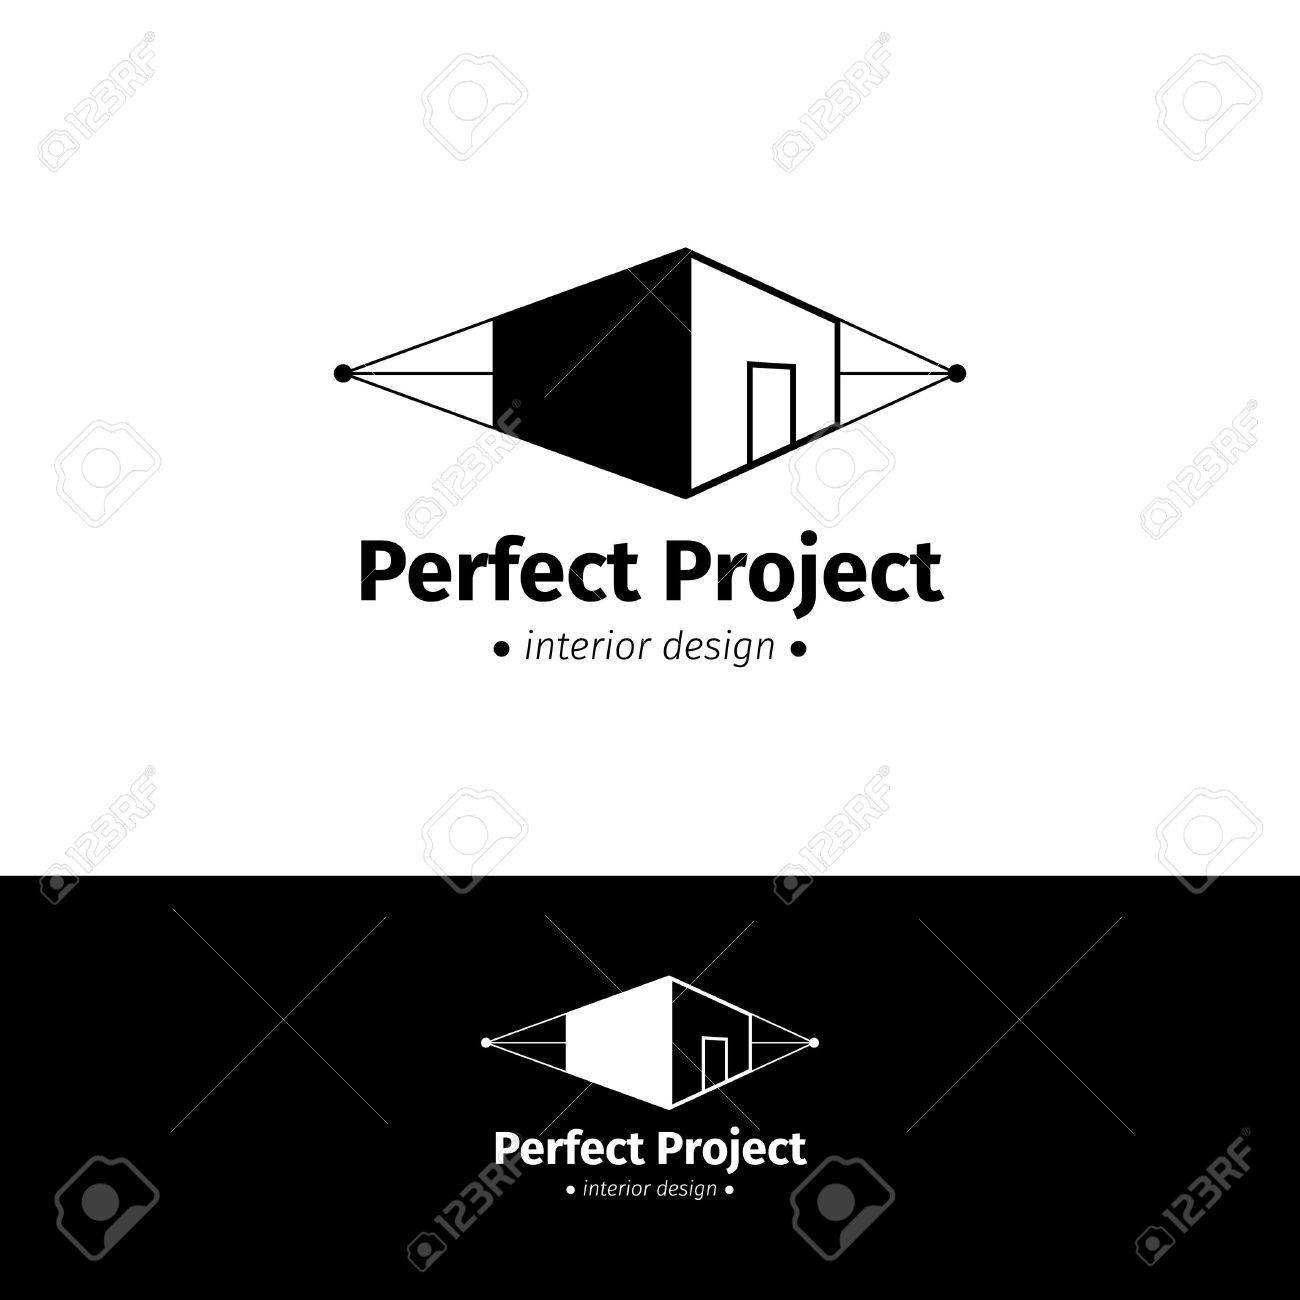 Vector Modern Minimalist House Design Logo. oyalty Free liparts ... - ^